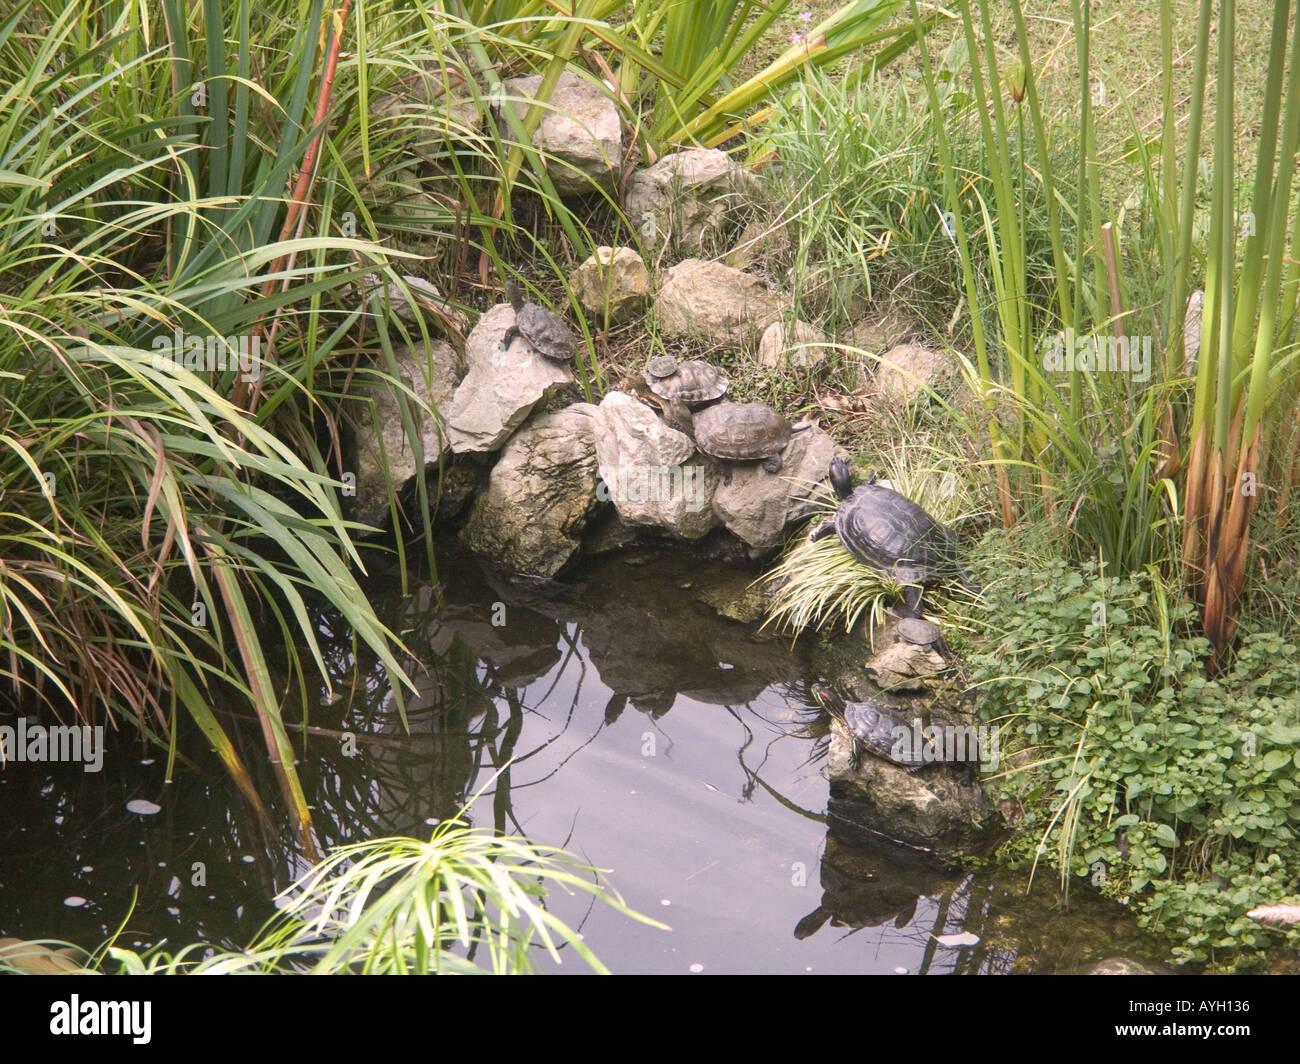 Ornamental ponds 100 images ponds clio mi creative for Ornamental pond fish uk